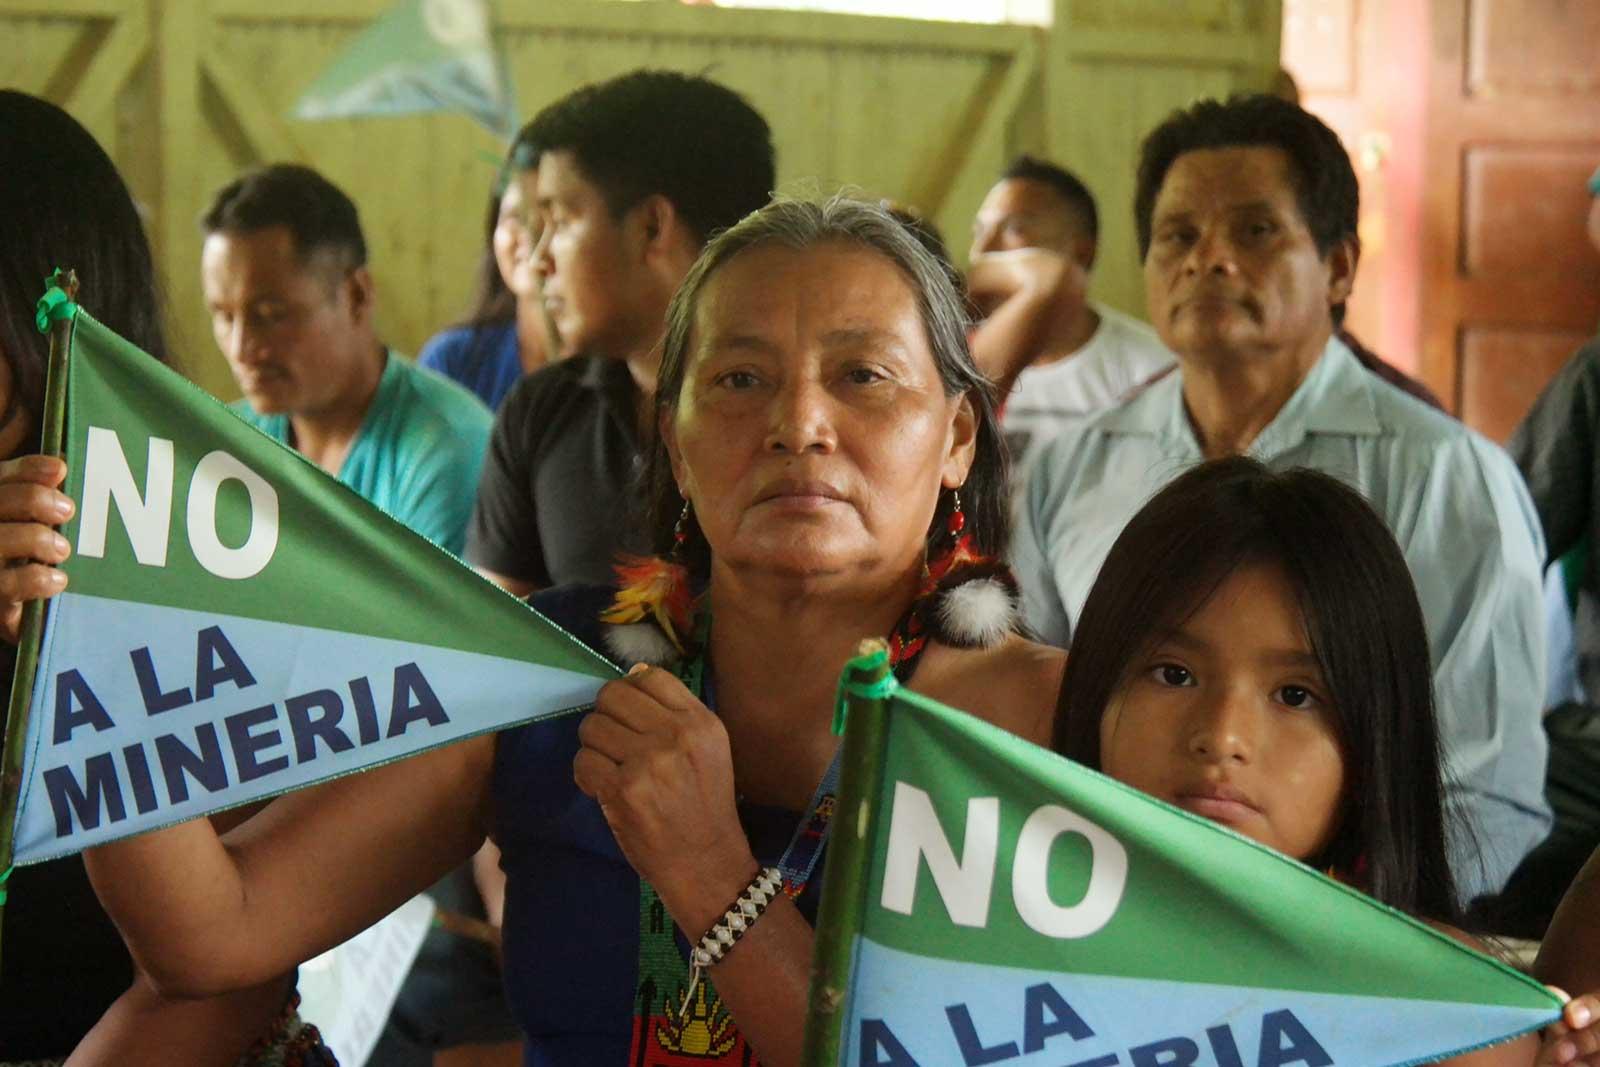 https://www.amazonfrontlines.org/m3di4/Rights-Defenders-Under-Threat-in-Ecuador-Amazon-Shuar-Arutam-mining-2.jpg